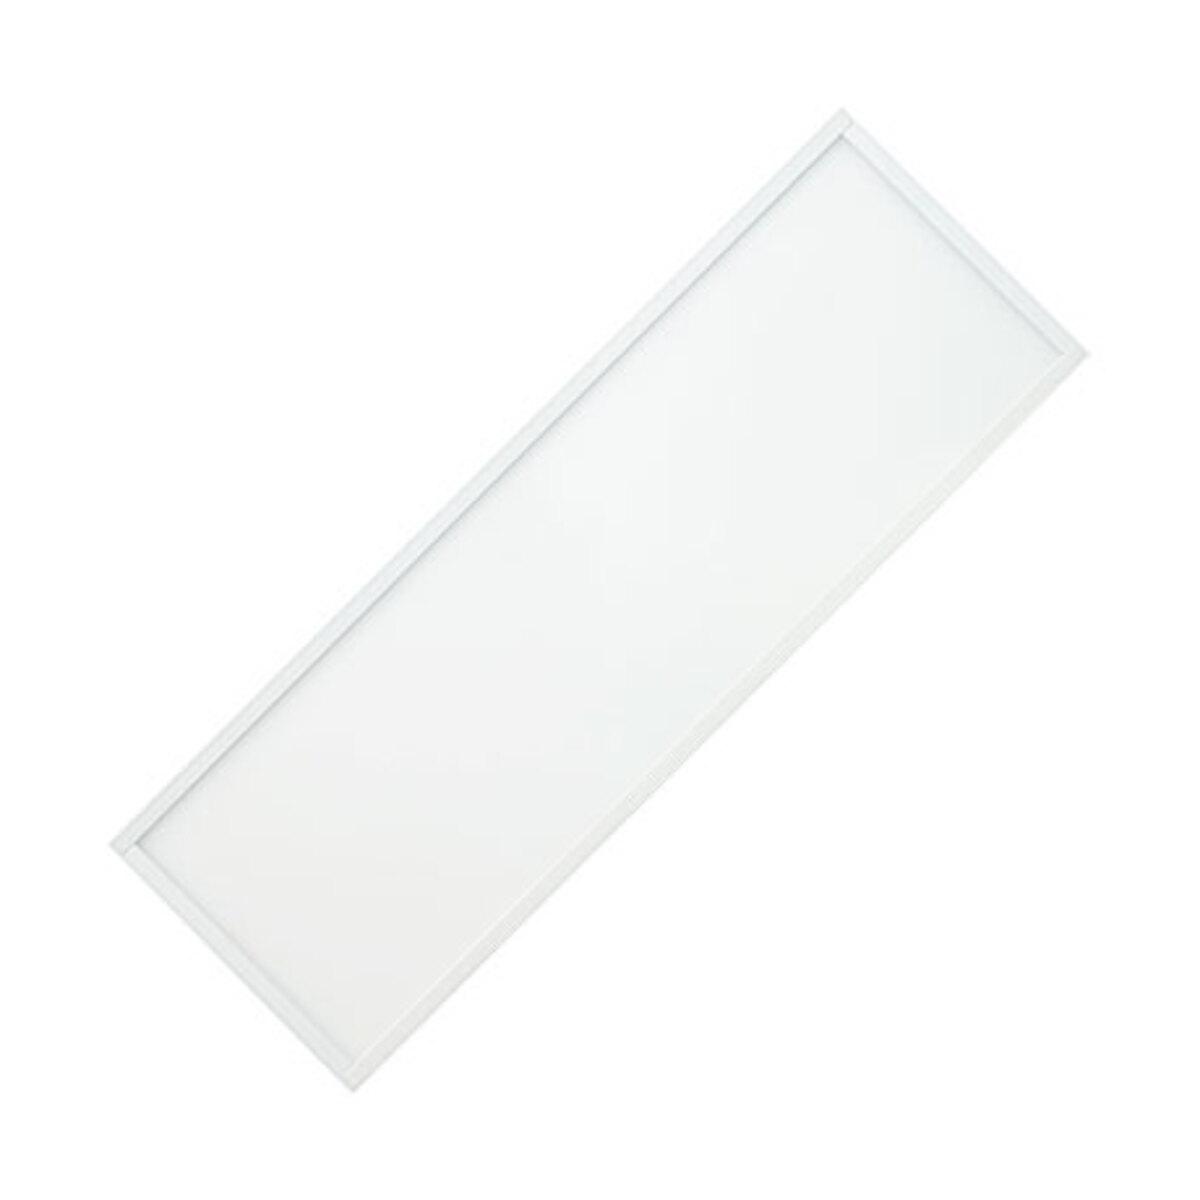 Bild 4 von LED-Panel Switch Tone 120x20cm